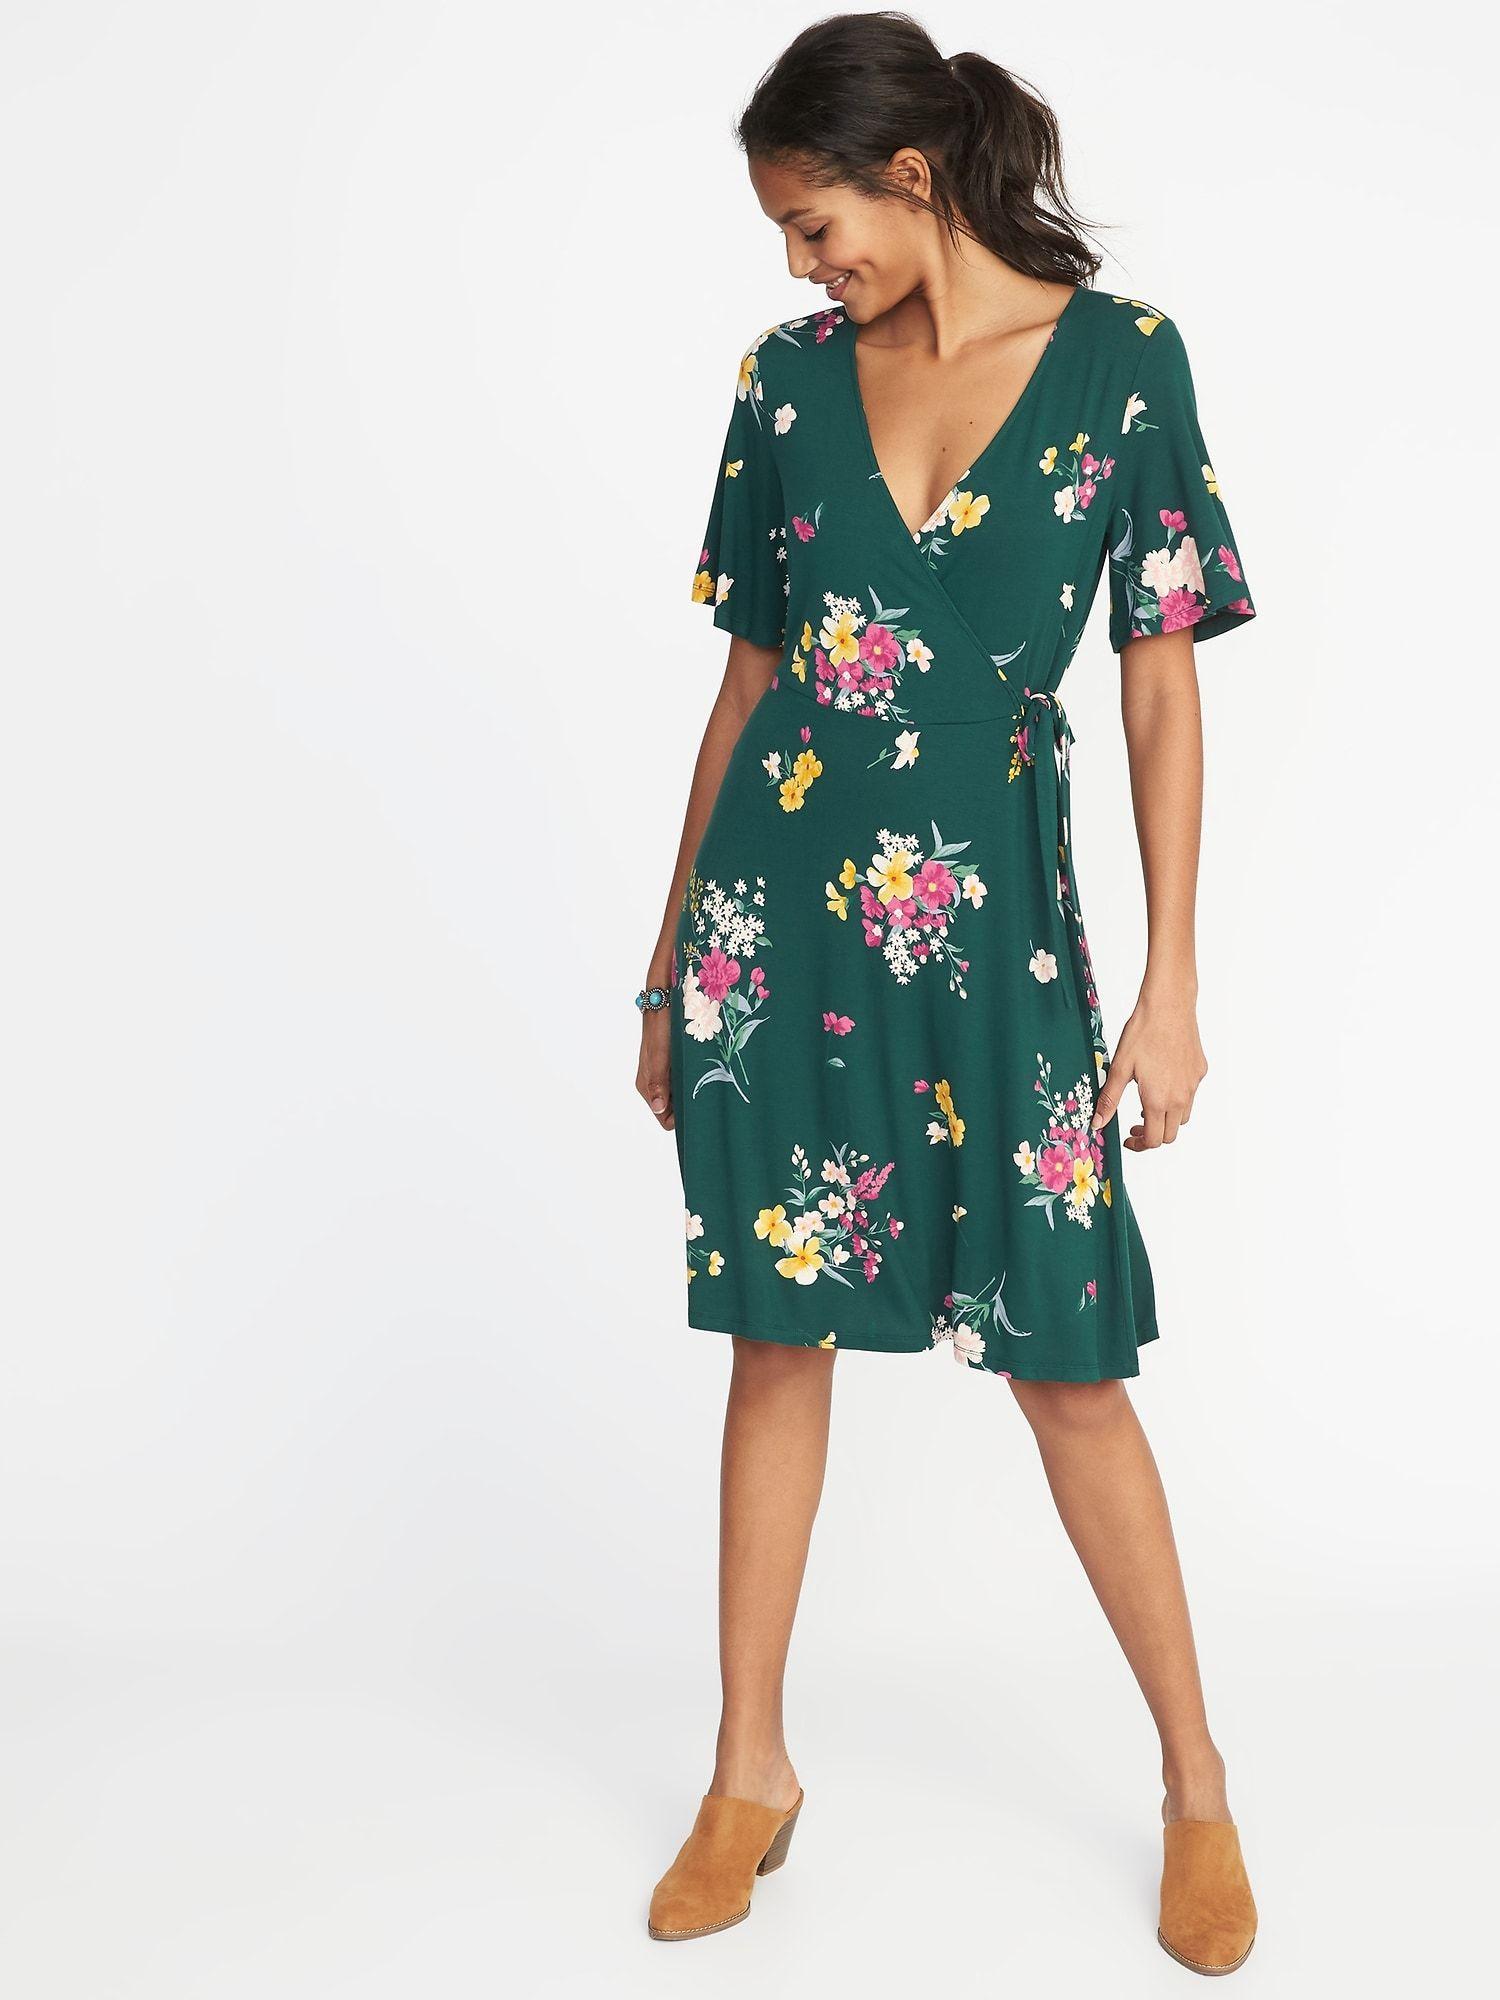 Old Navy Faux Wrap Dress Womens 3X Plus Burgundy Floral Georgette Waist Defined